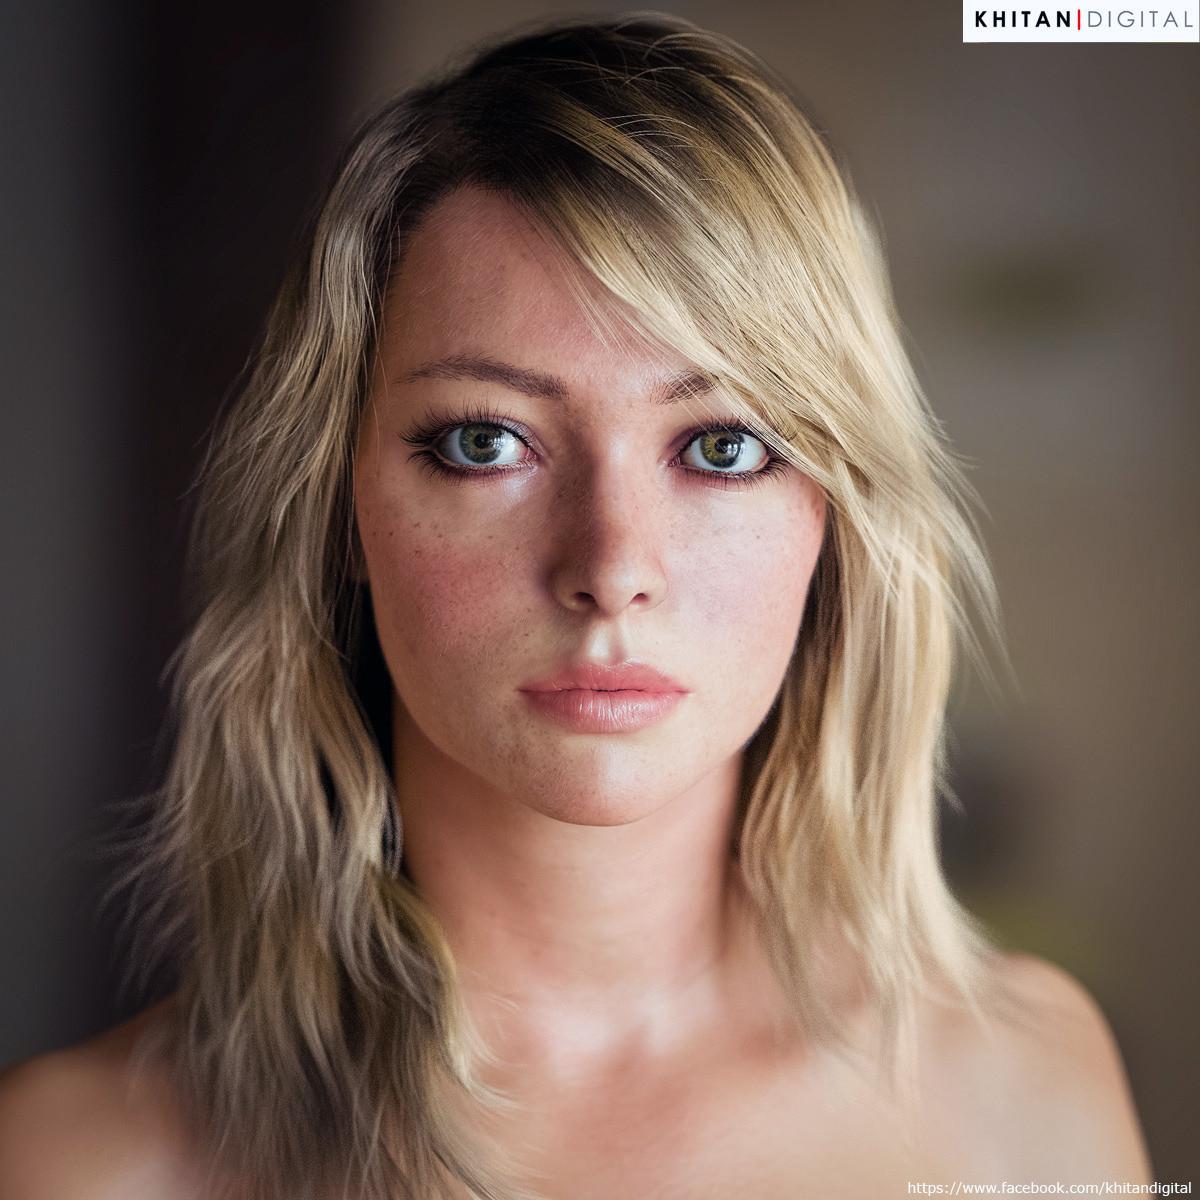 Portrait of a young woman / Khitan